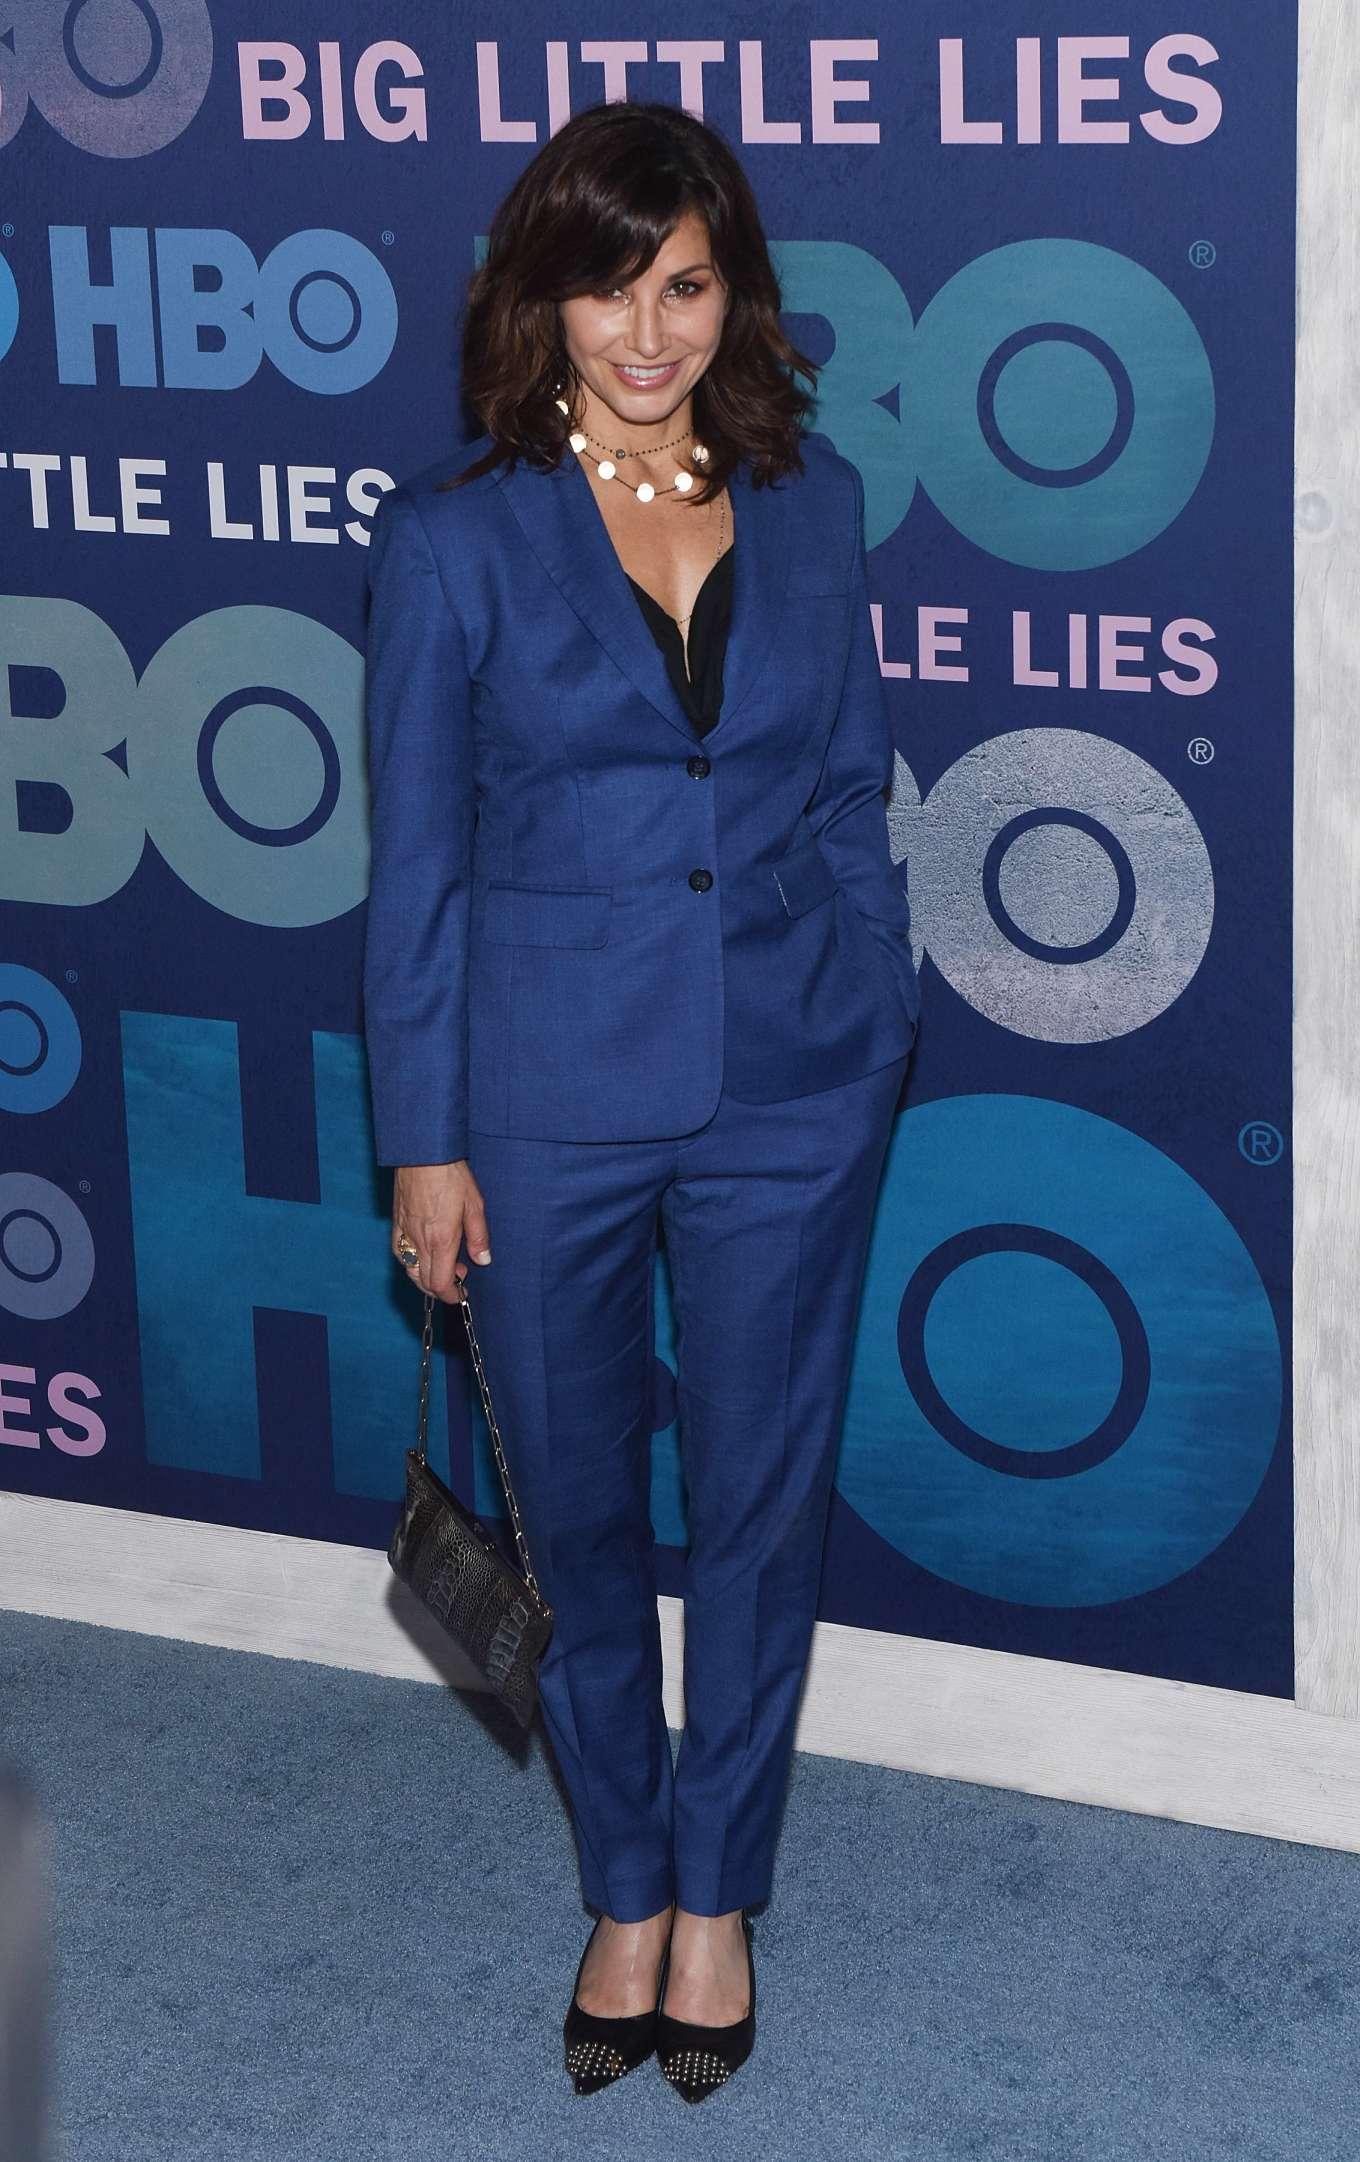 Gina Gershon 2019 : Gina Gershon: Big Little Lies Season 2 Premiere-04